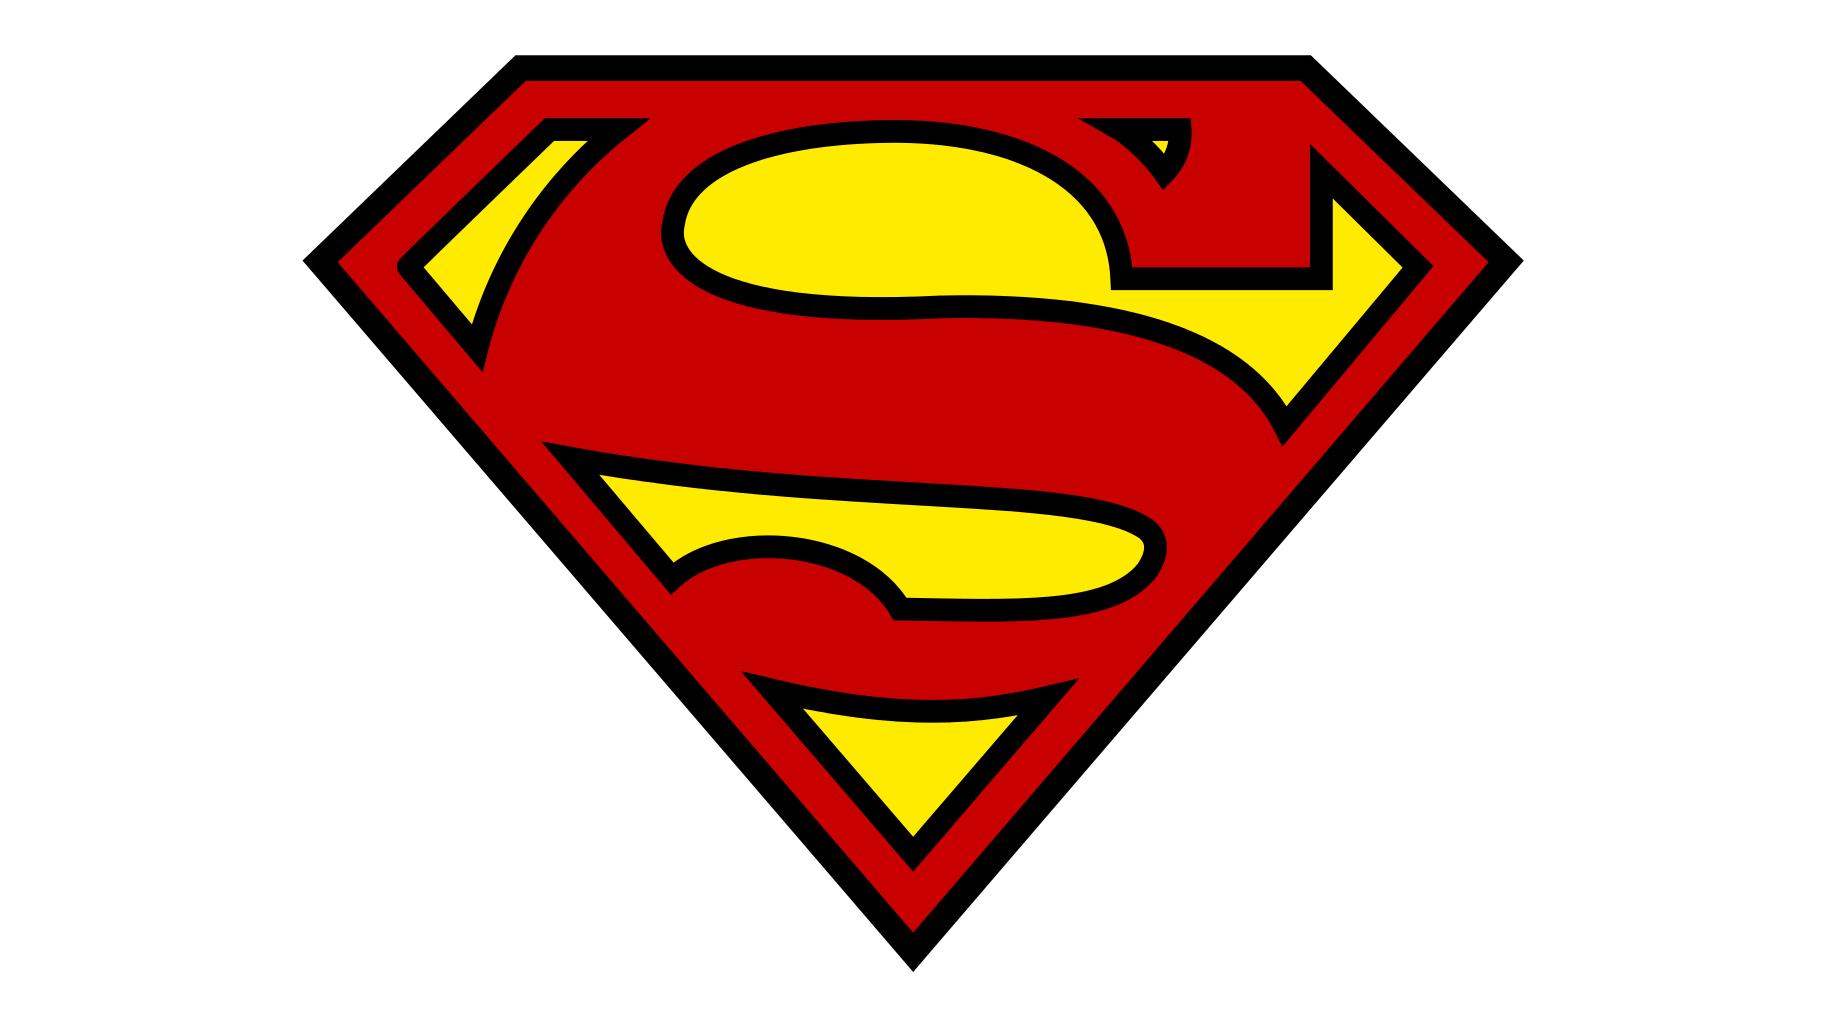 behind the scenes on seven superhero logos graphic design rh avantgraphic com Superhero Logo Vector create your own superhero logo free